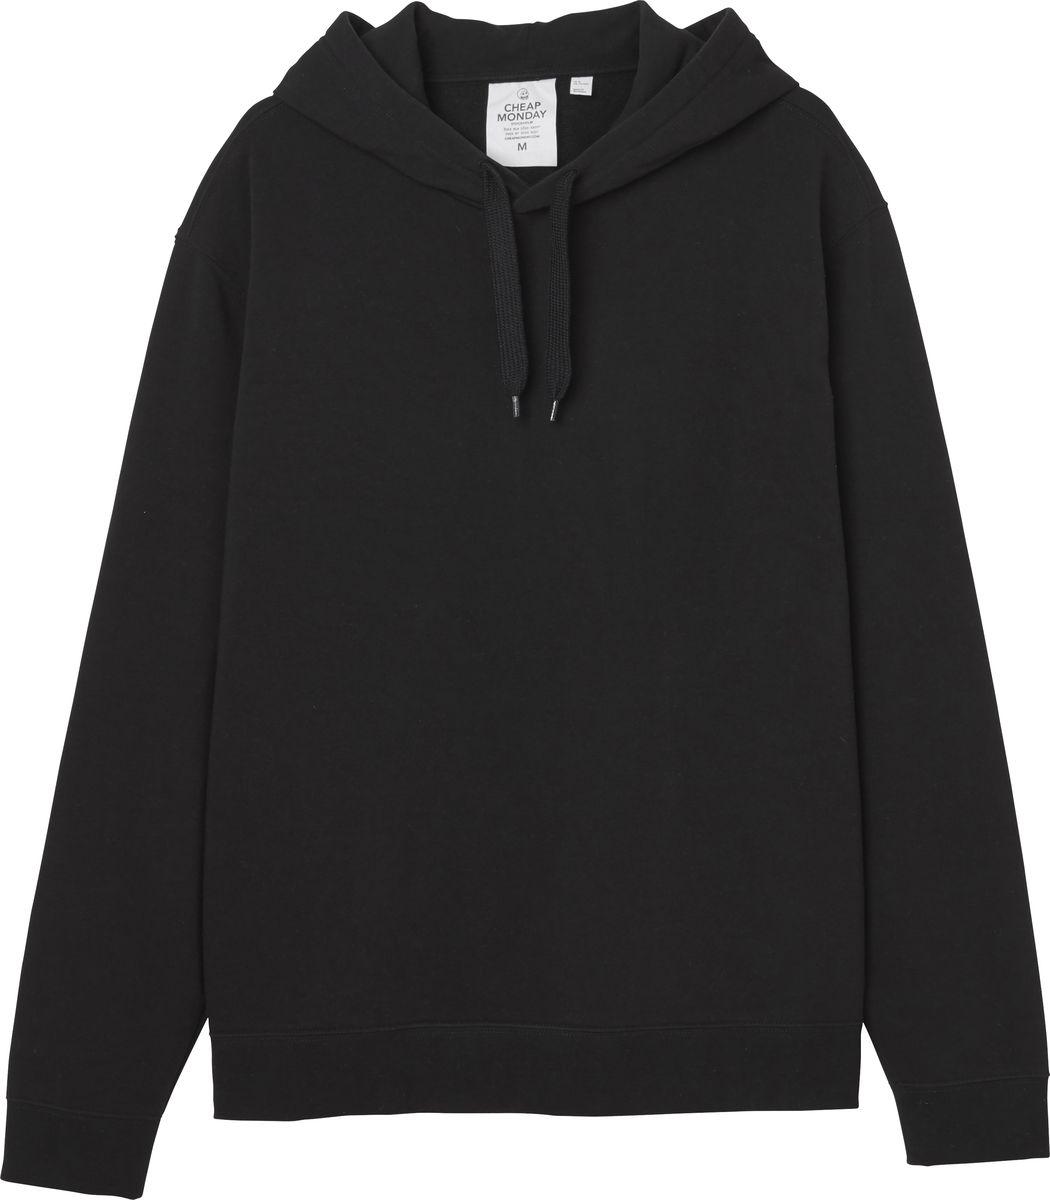 Толстовка мужская Cheap Monday, цвет: черный. 0553185. Размер XS (44) cheap monday шарф